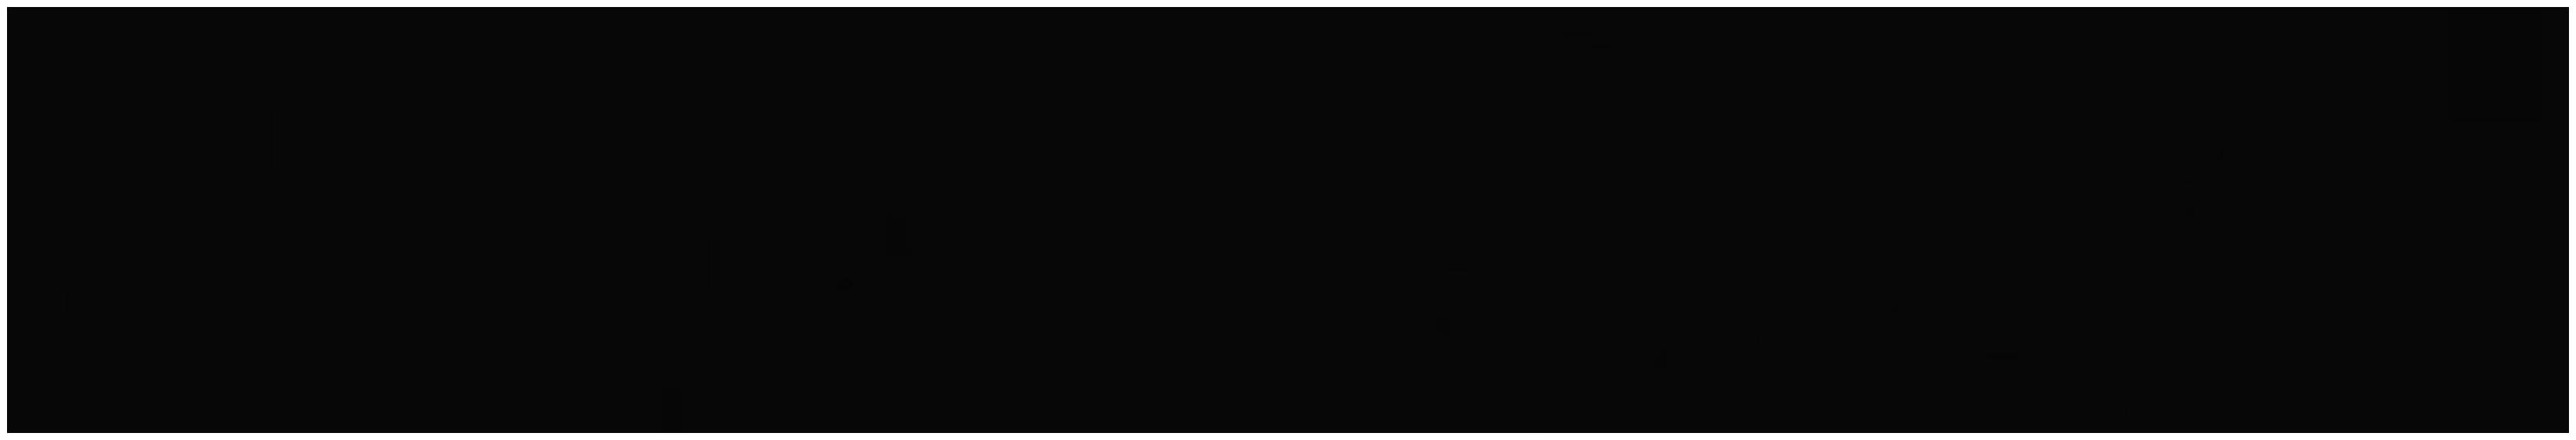 Baystate Health's Logo